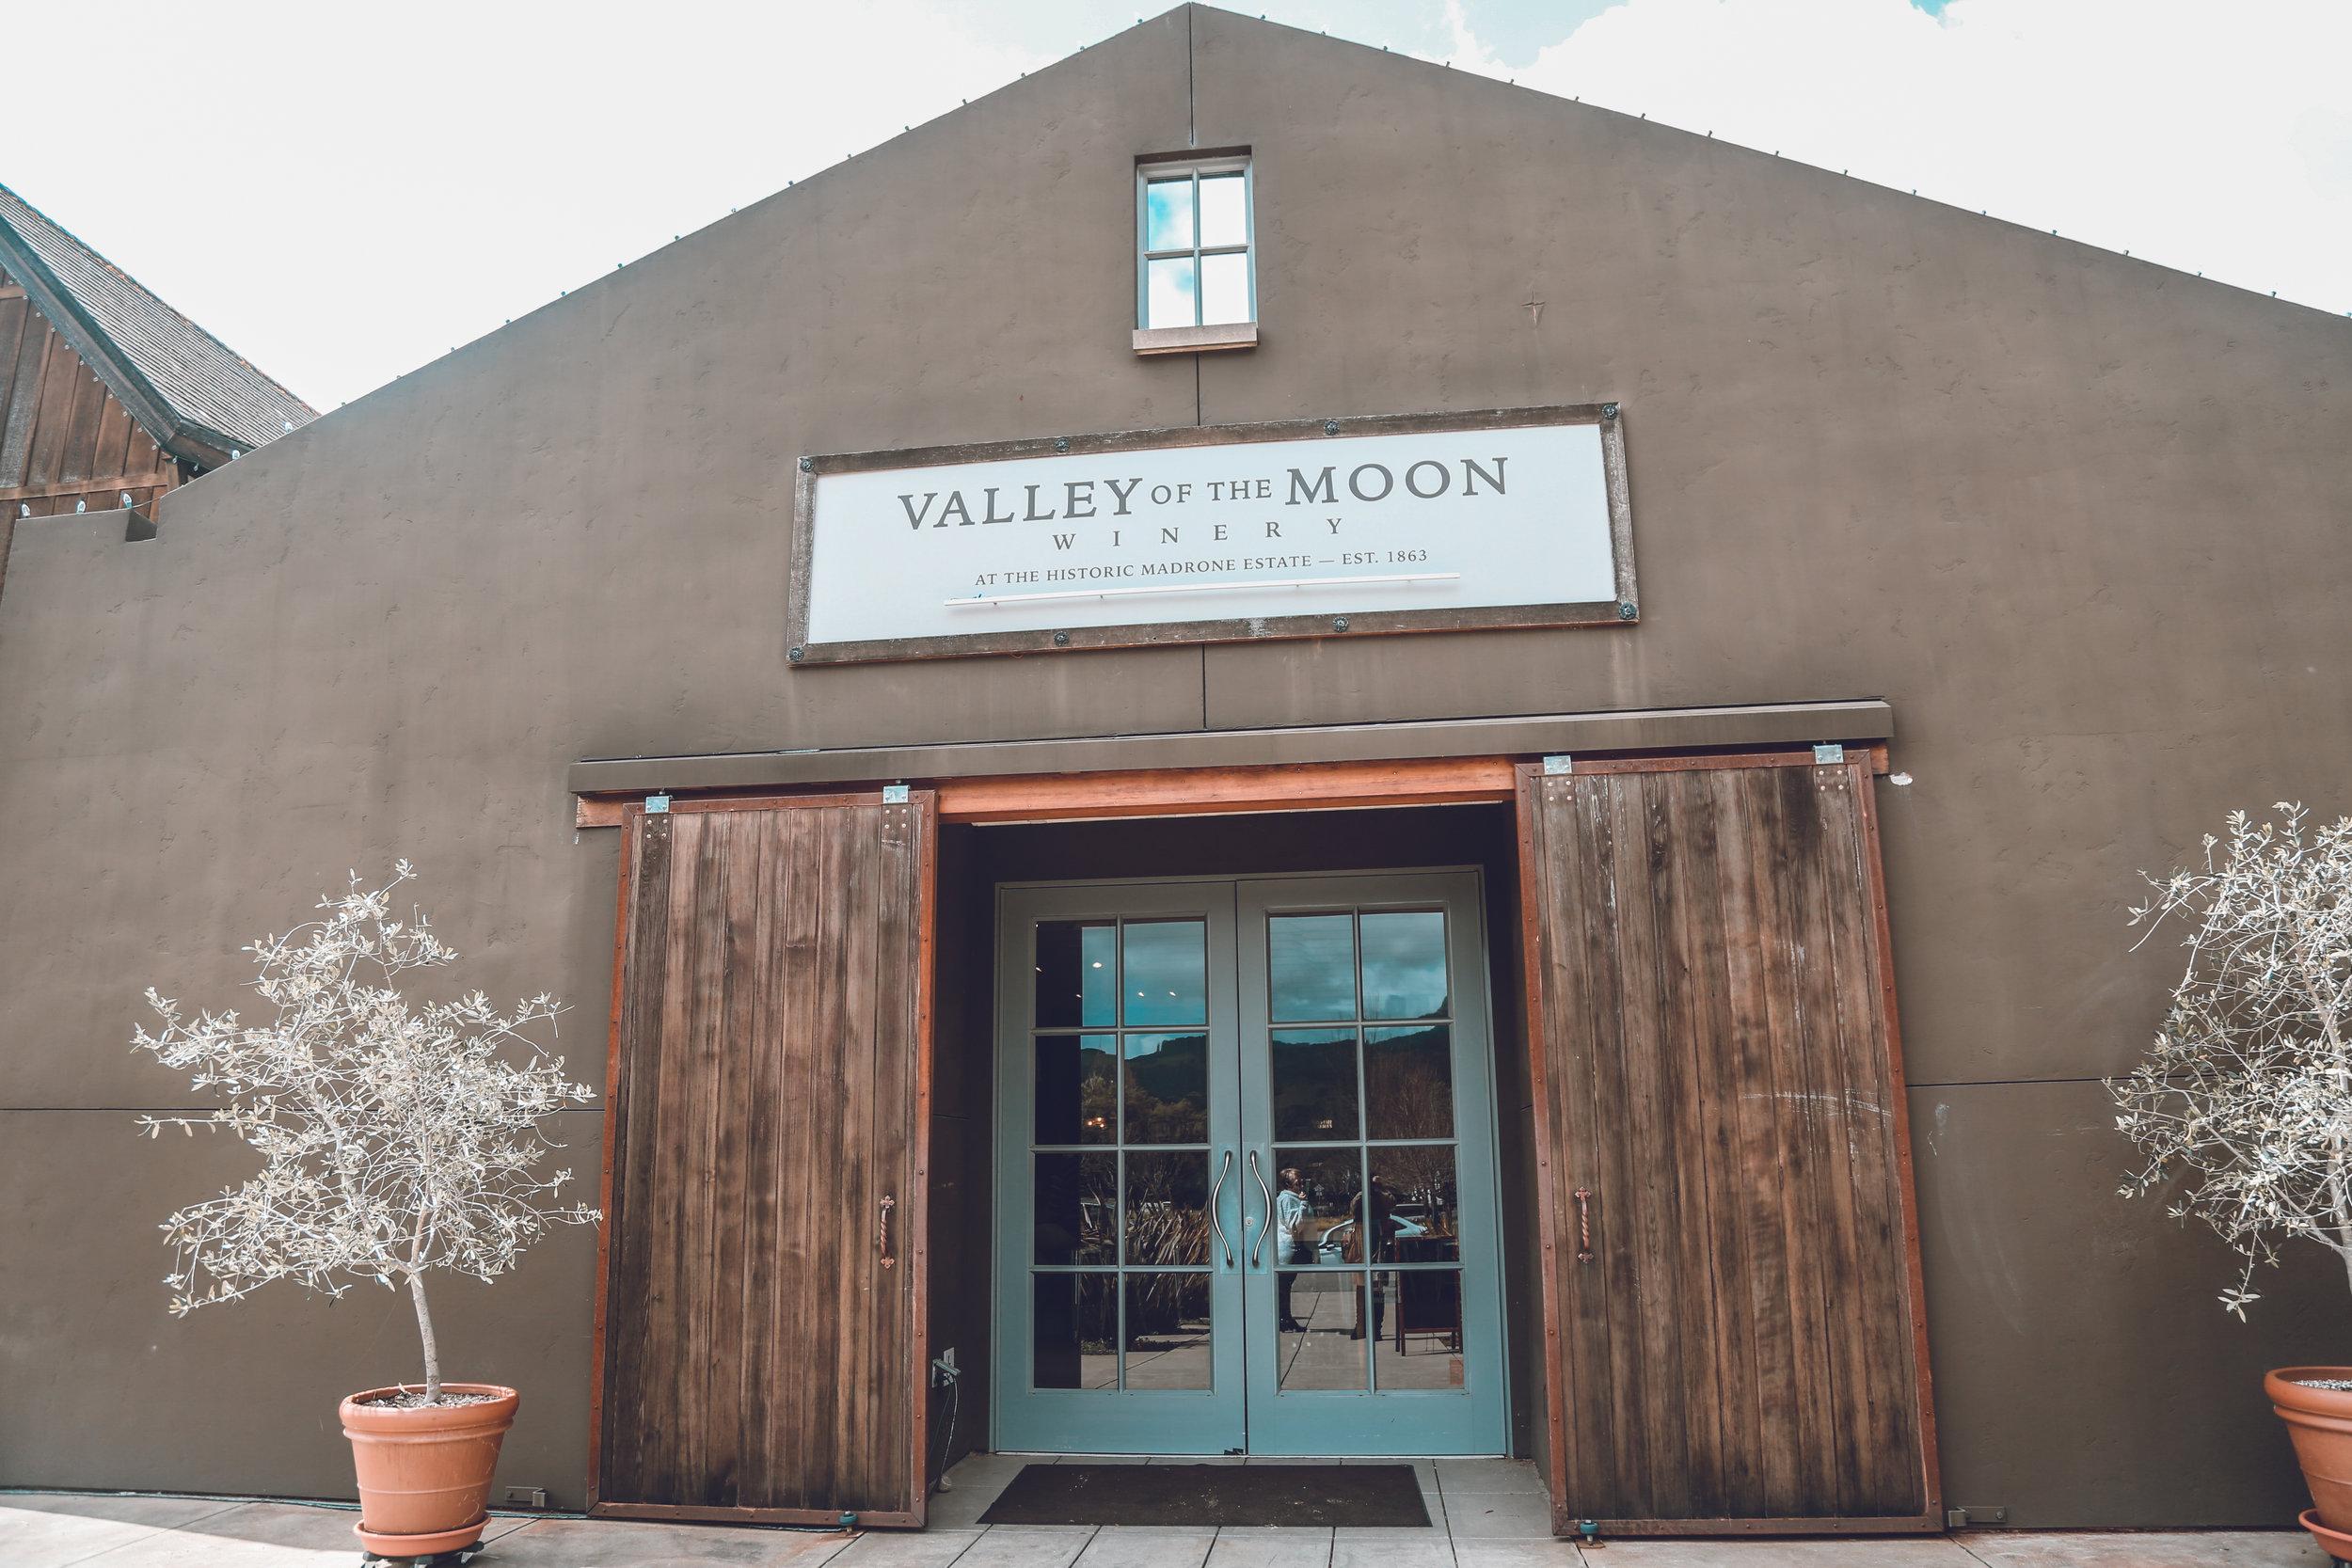 valleyofthemoon-20.jpg